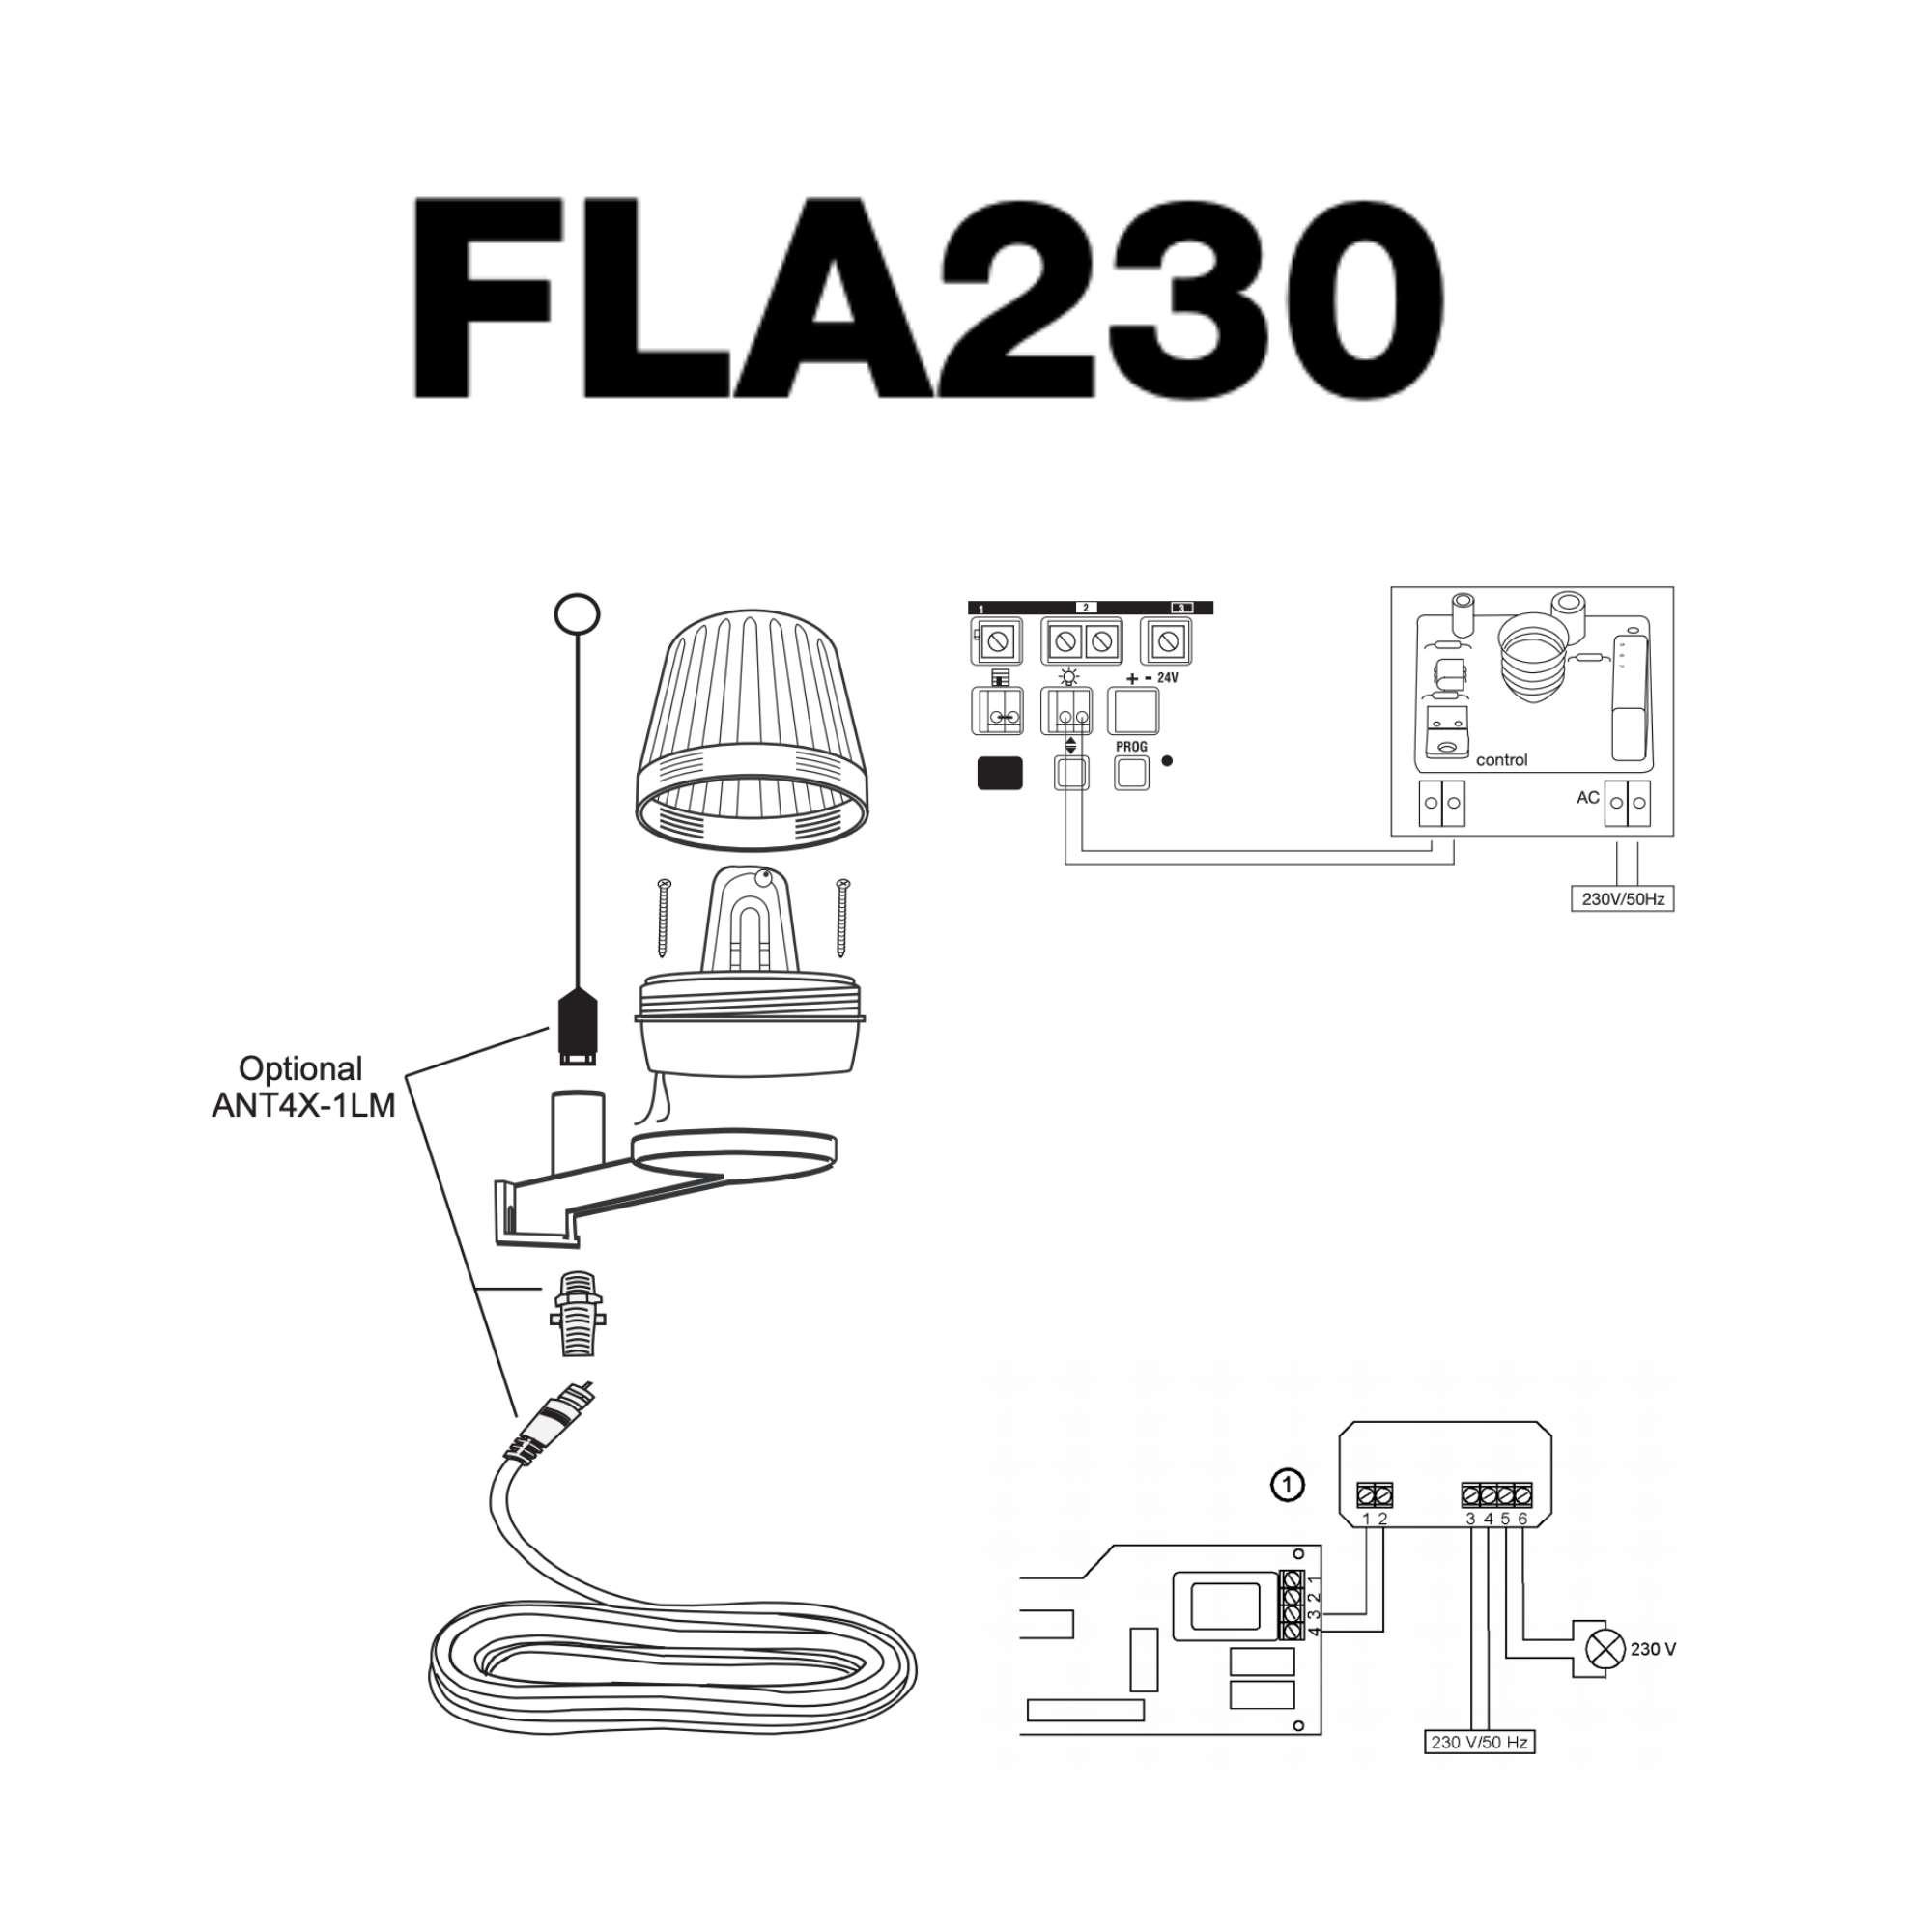 Installation of FLA230 – Flashing light kit